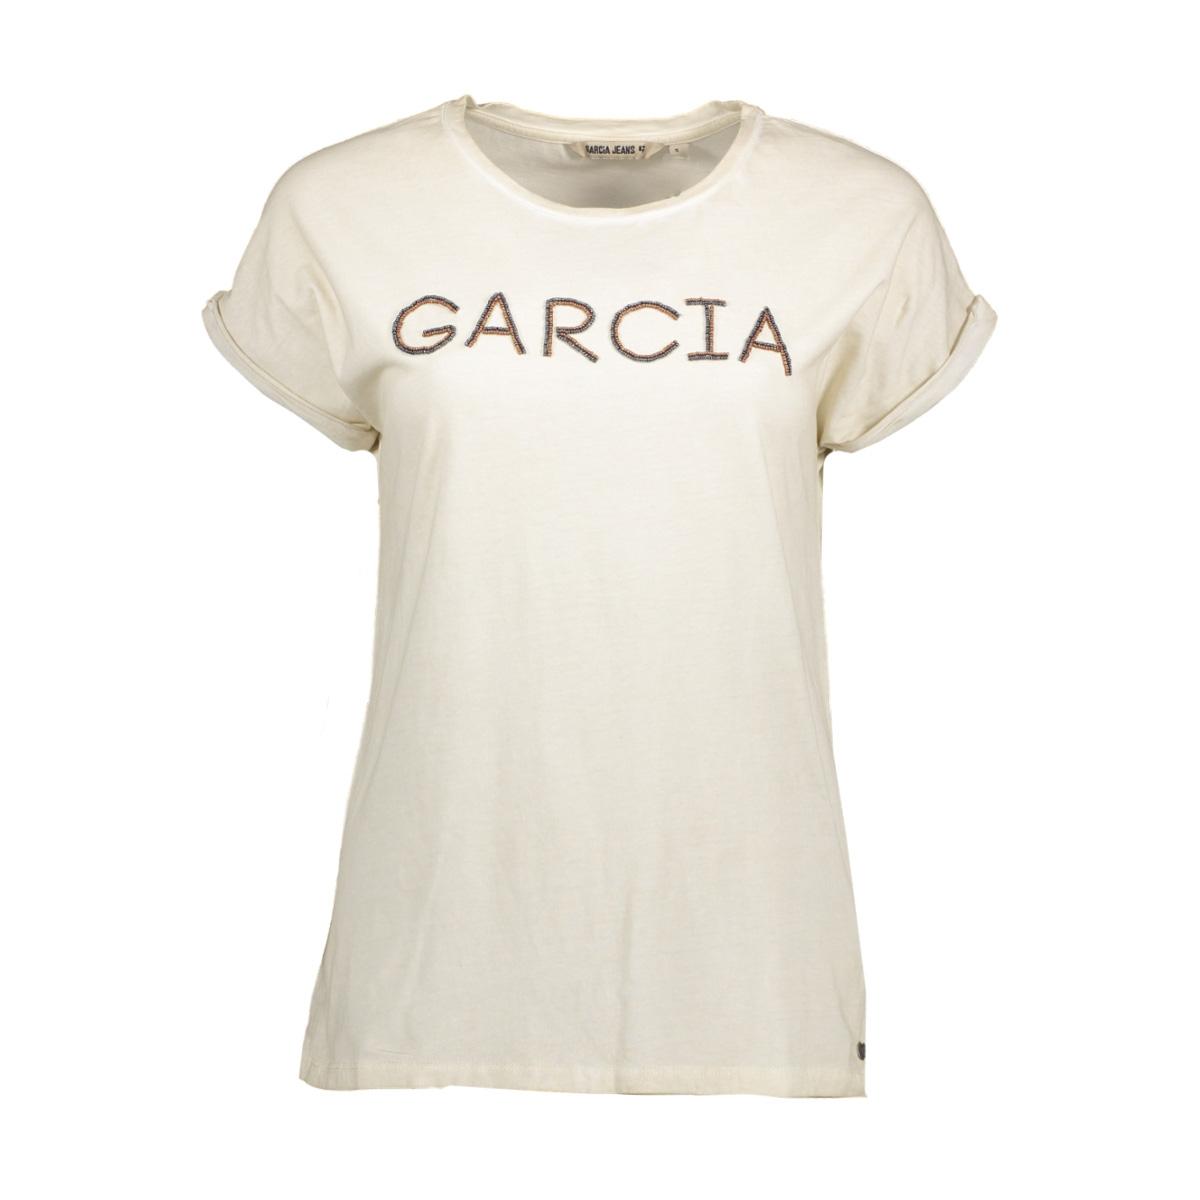 i70007 garcia t-shirt 950